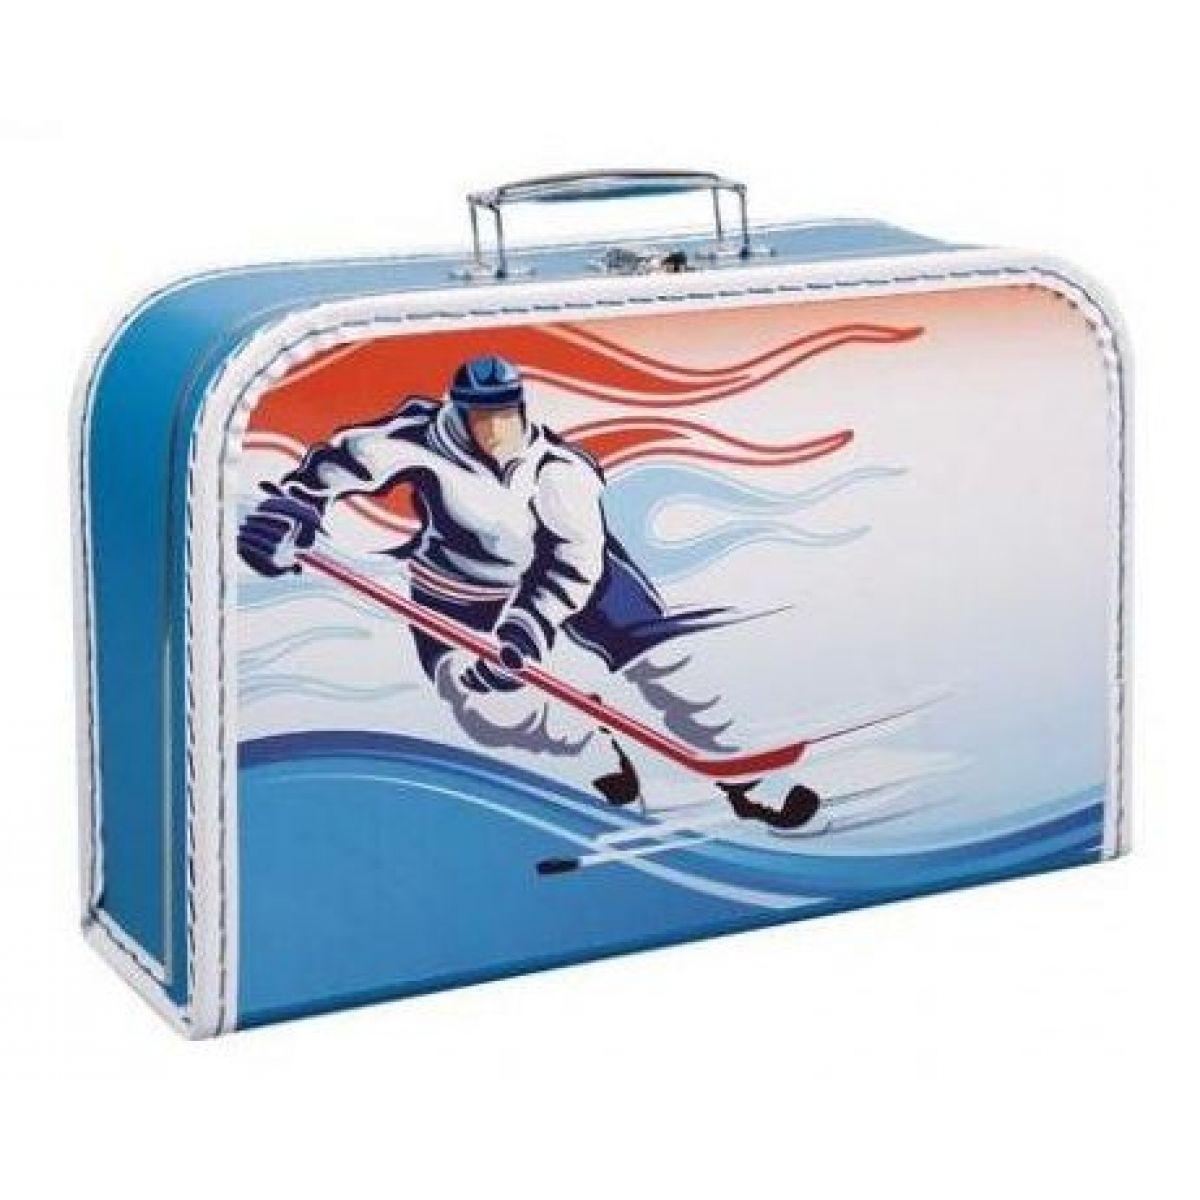 Kufřík hokejista, modrý 35 cm